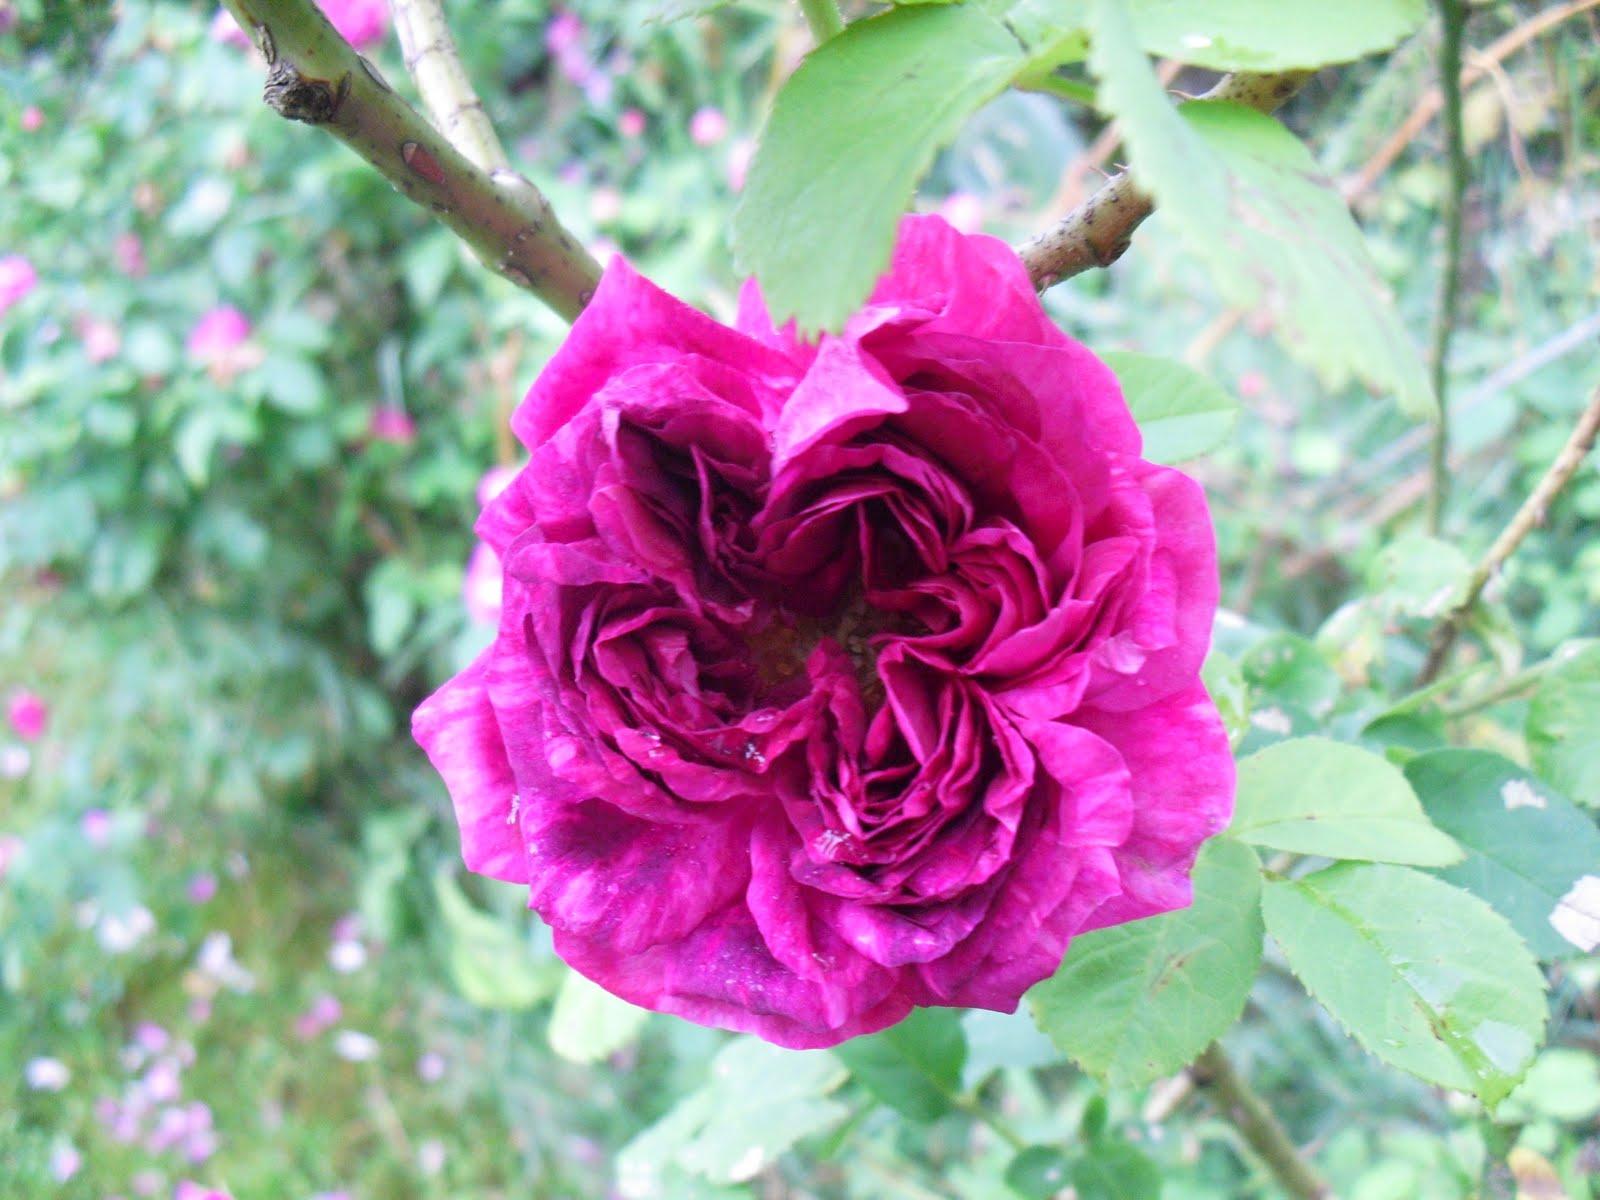 http://4.bp.blogspot.com/_ZGAH9dSpC5M/TFqLyJbHjhI/AAAAAAAABrY/6GcXu3hqIbY/s1600/Blomstring+31.+Juli+2010+065.JPG